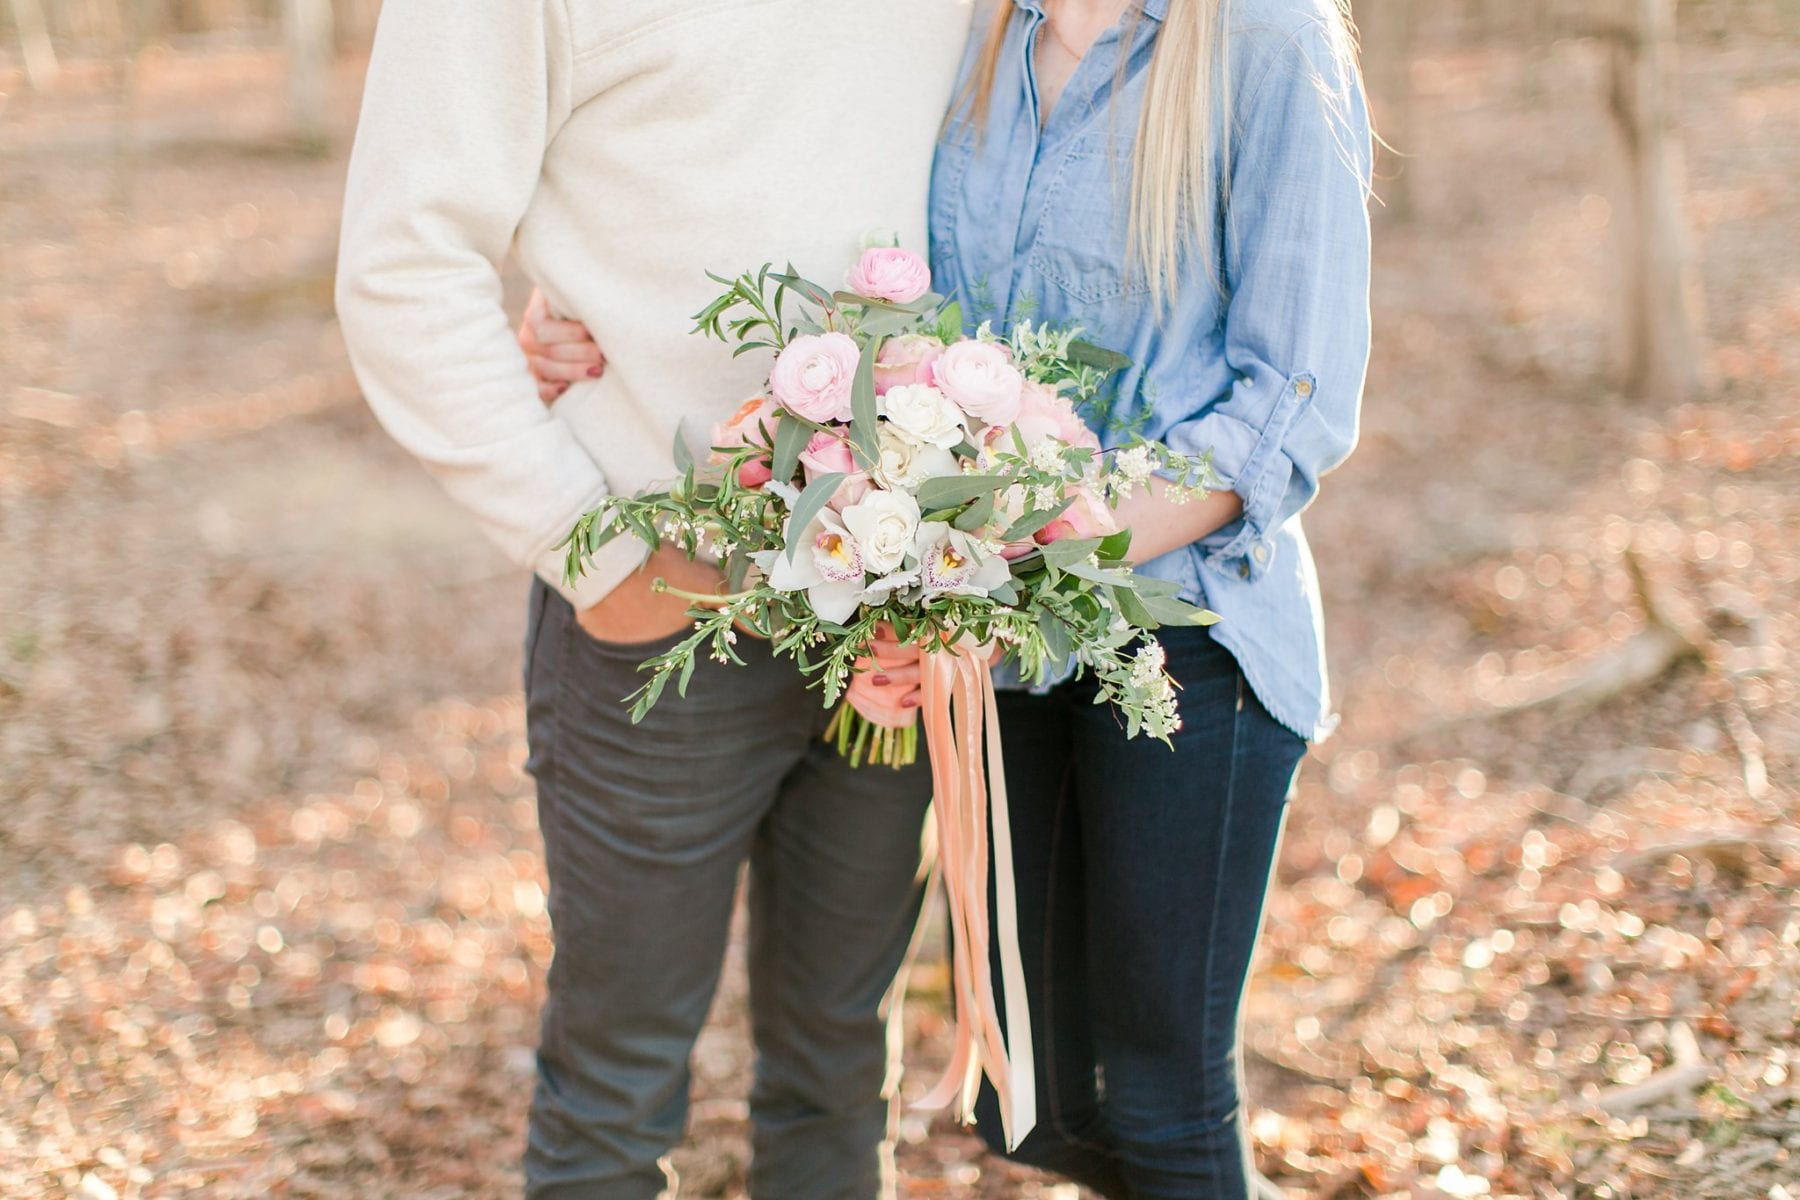 Manassas Battlefield Engagement Session Virginia Wedding Photographer Danielle & Charlie Megan Kelsey Photography-5446.jpg